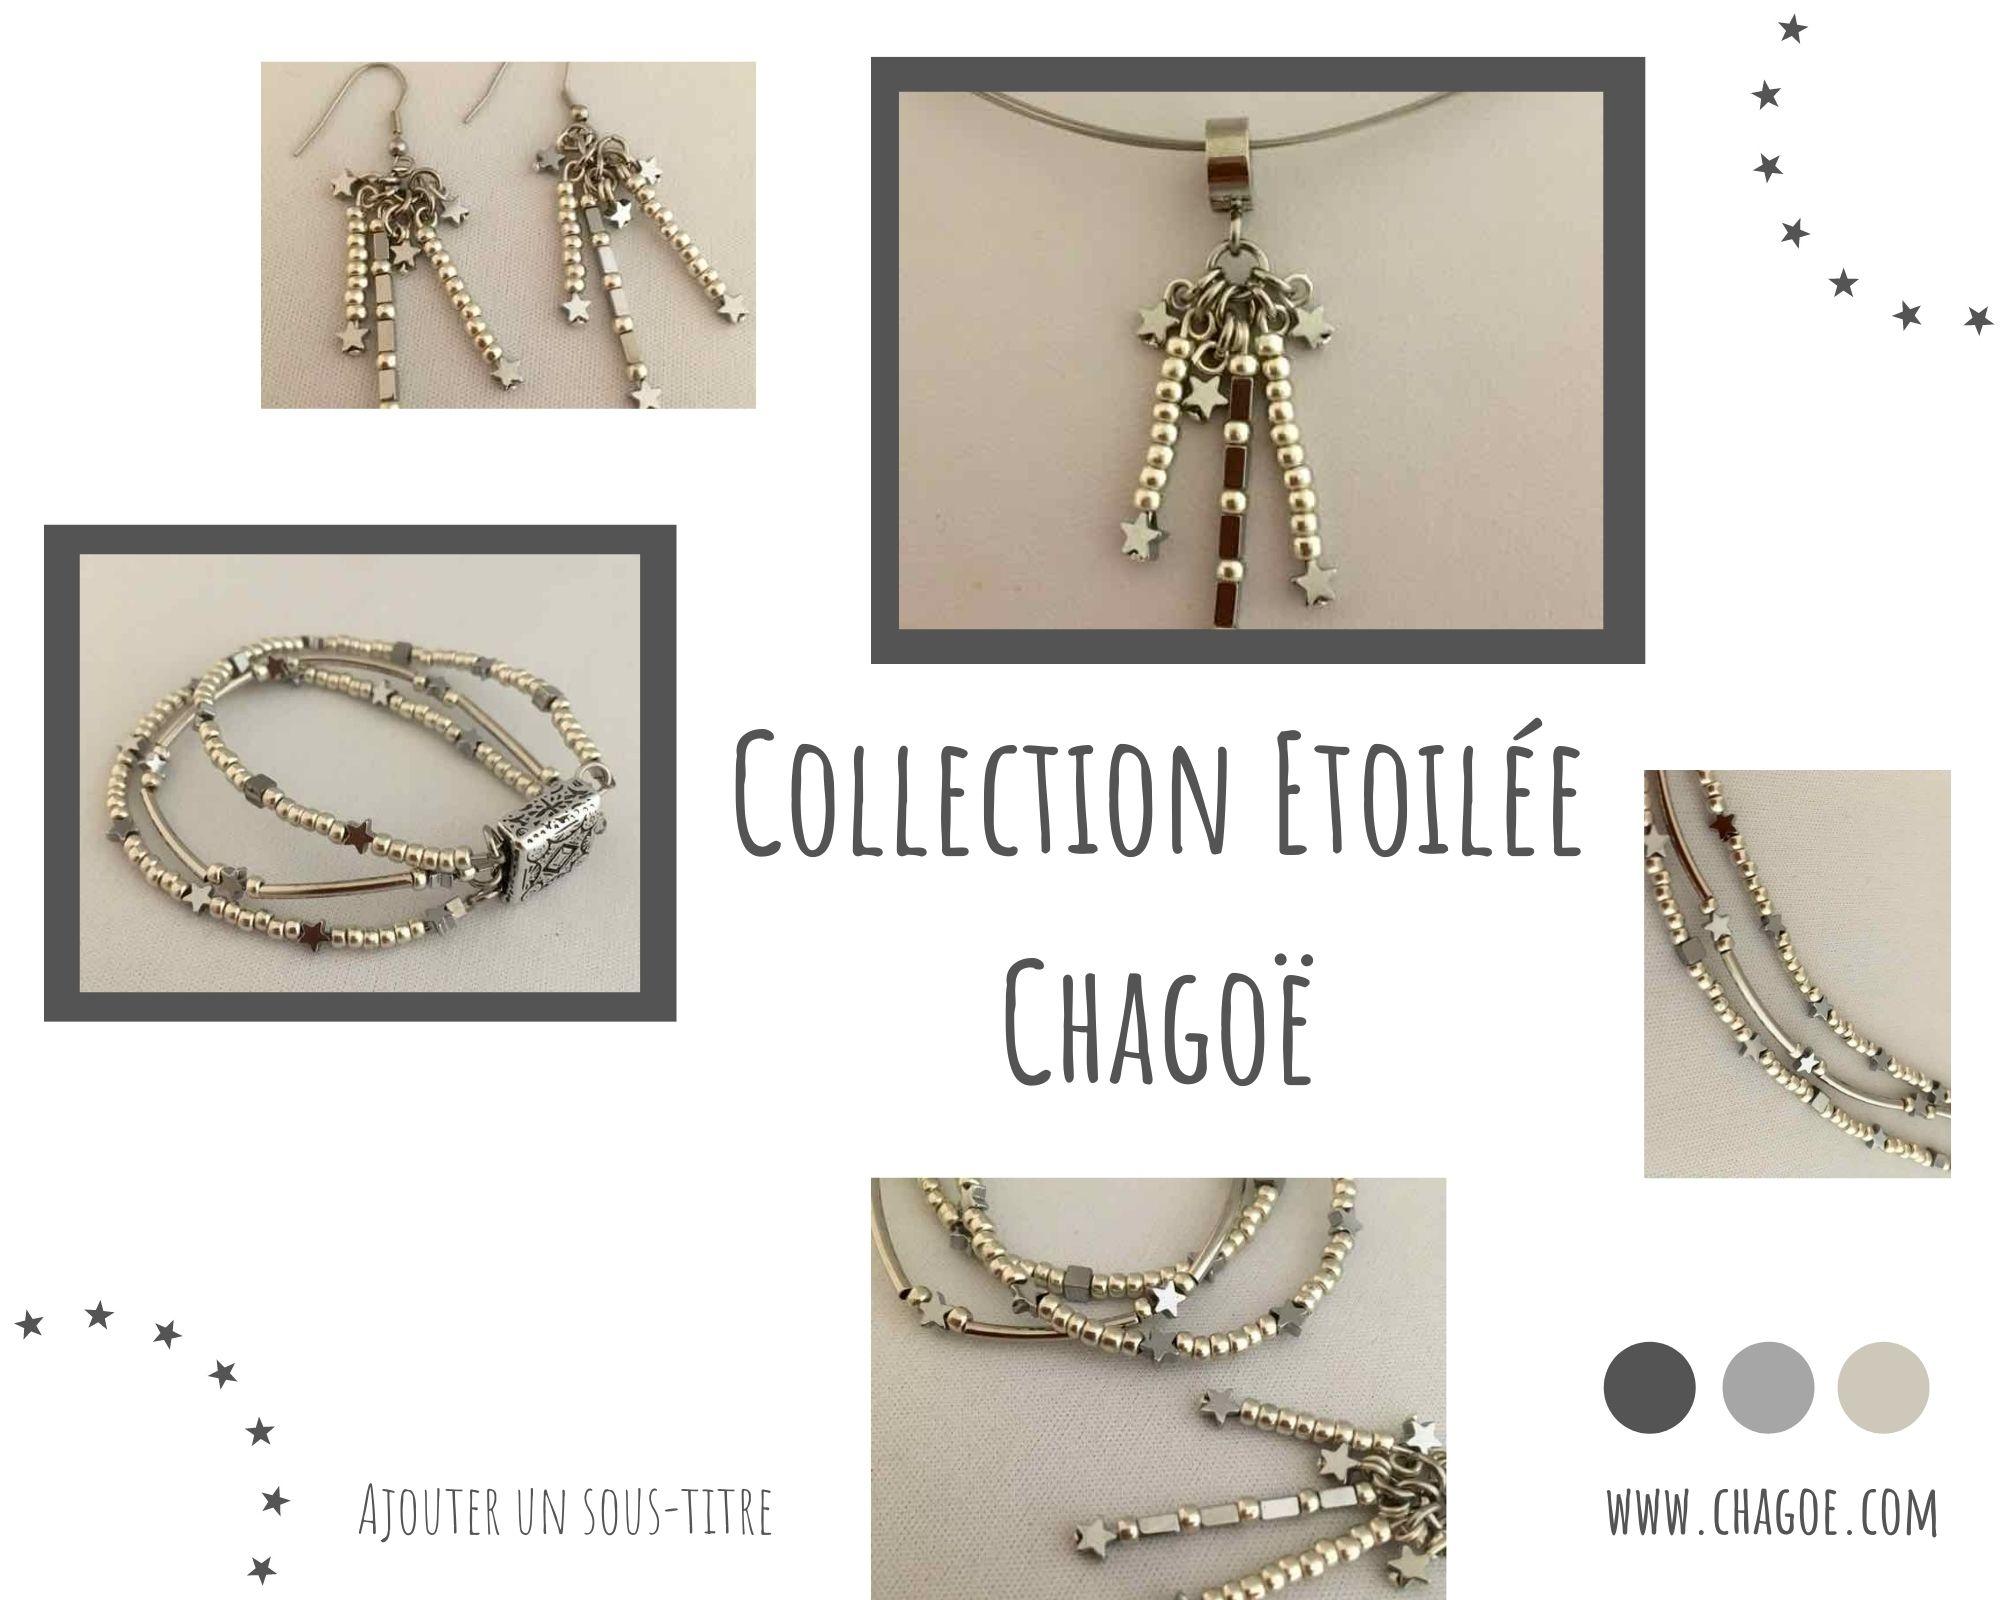 Collection ETOILEE Chagoë 2021